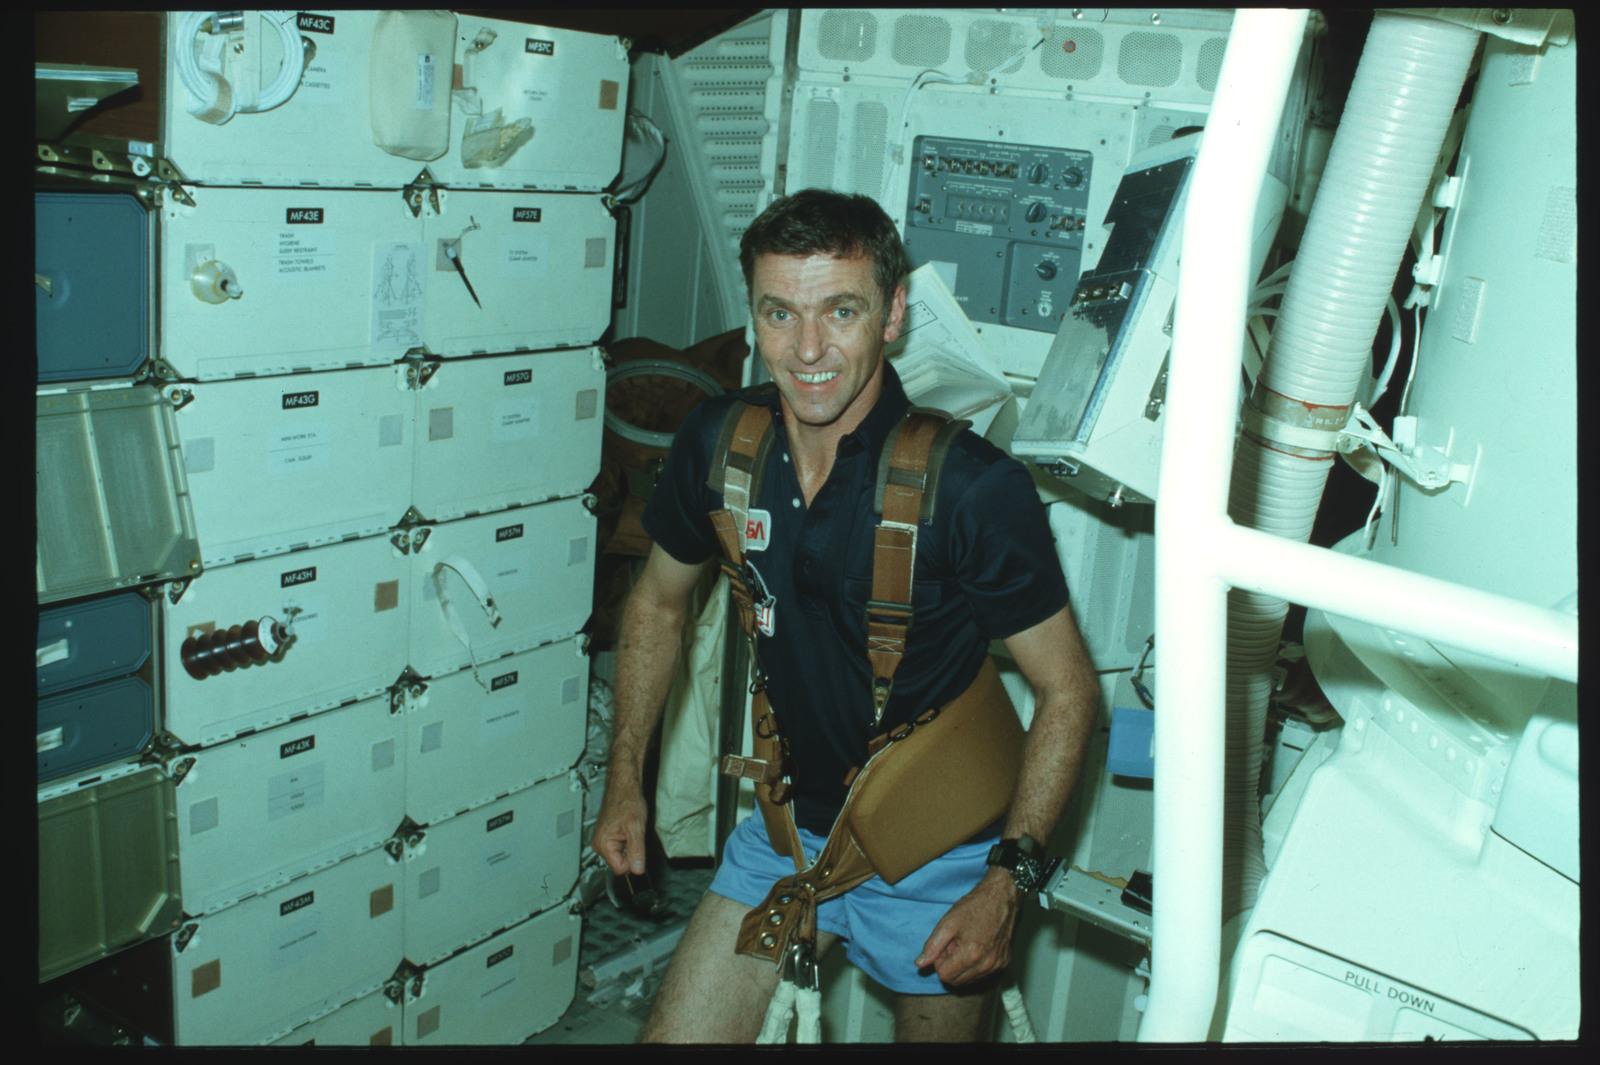 S02-02-880 - STS-002 - Commander Engle exercises on middeck using exerciser restraint harness